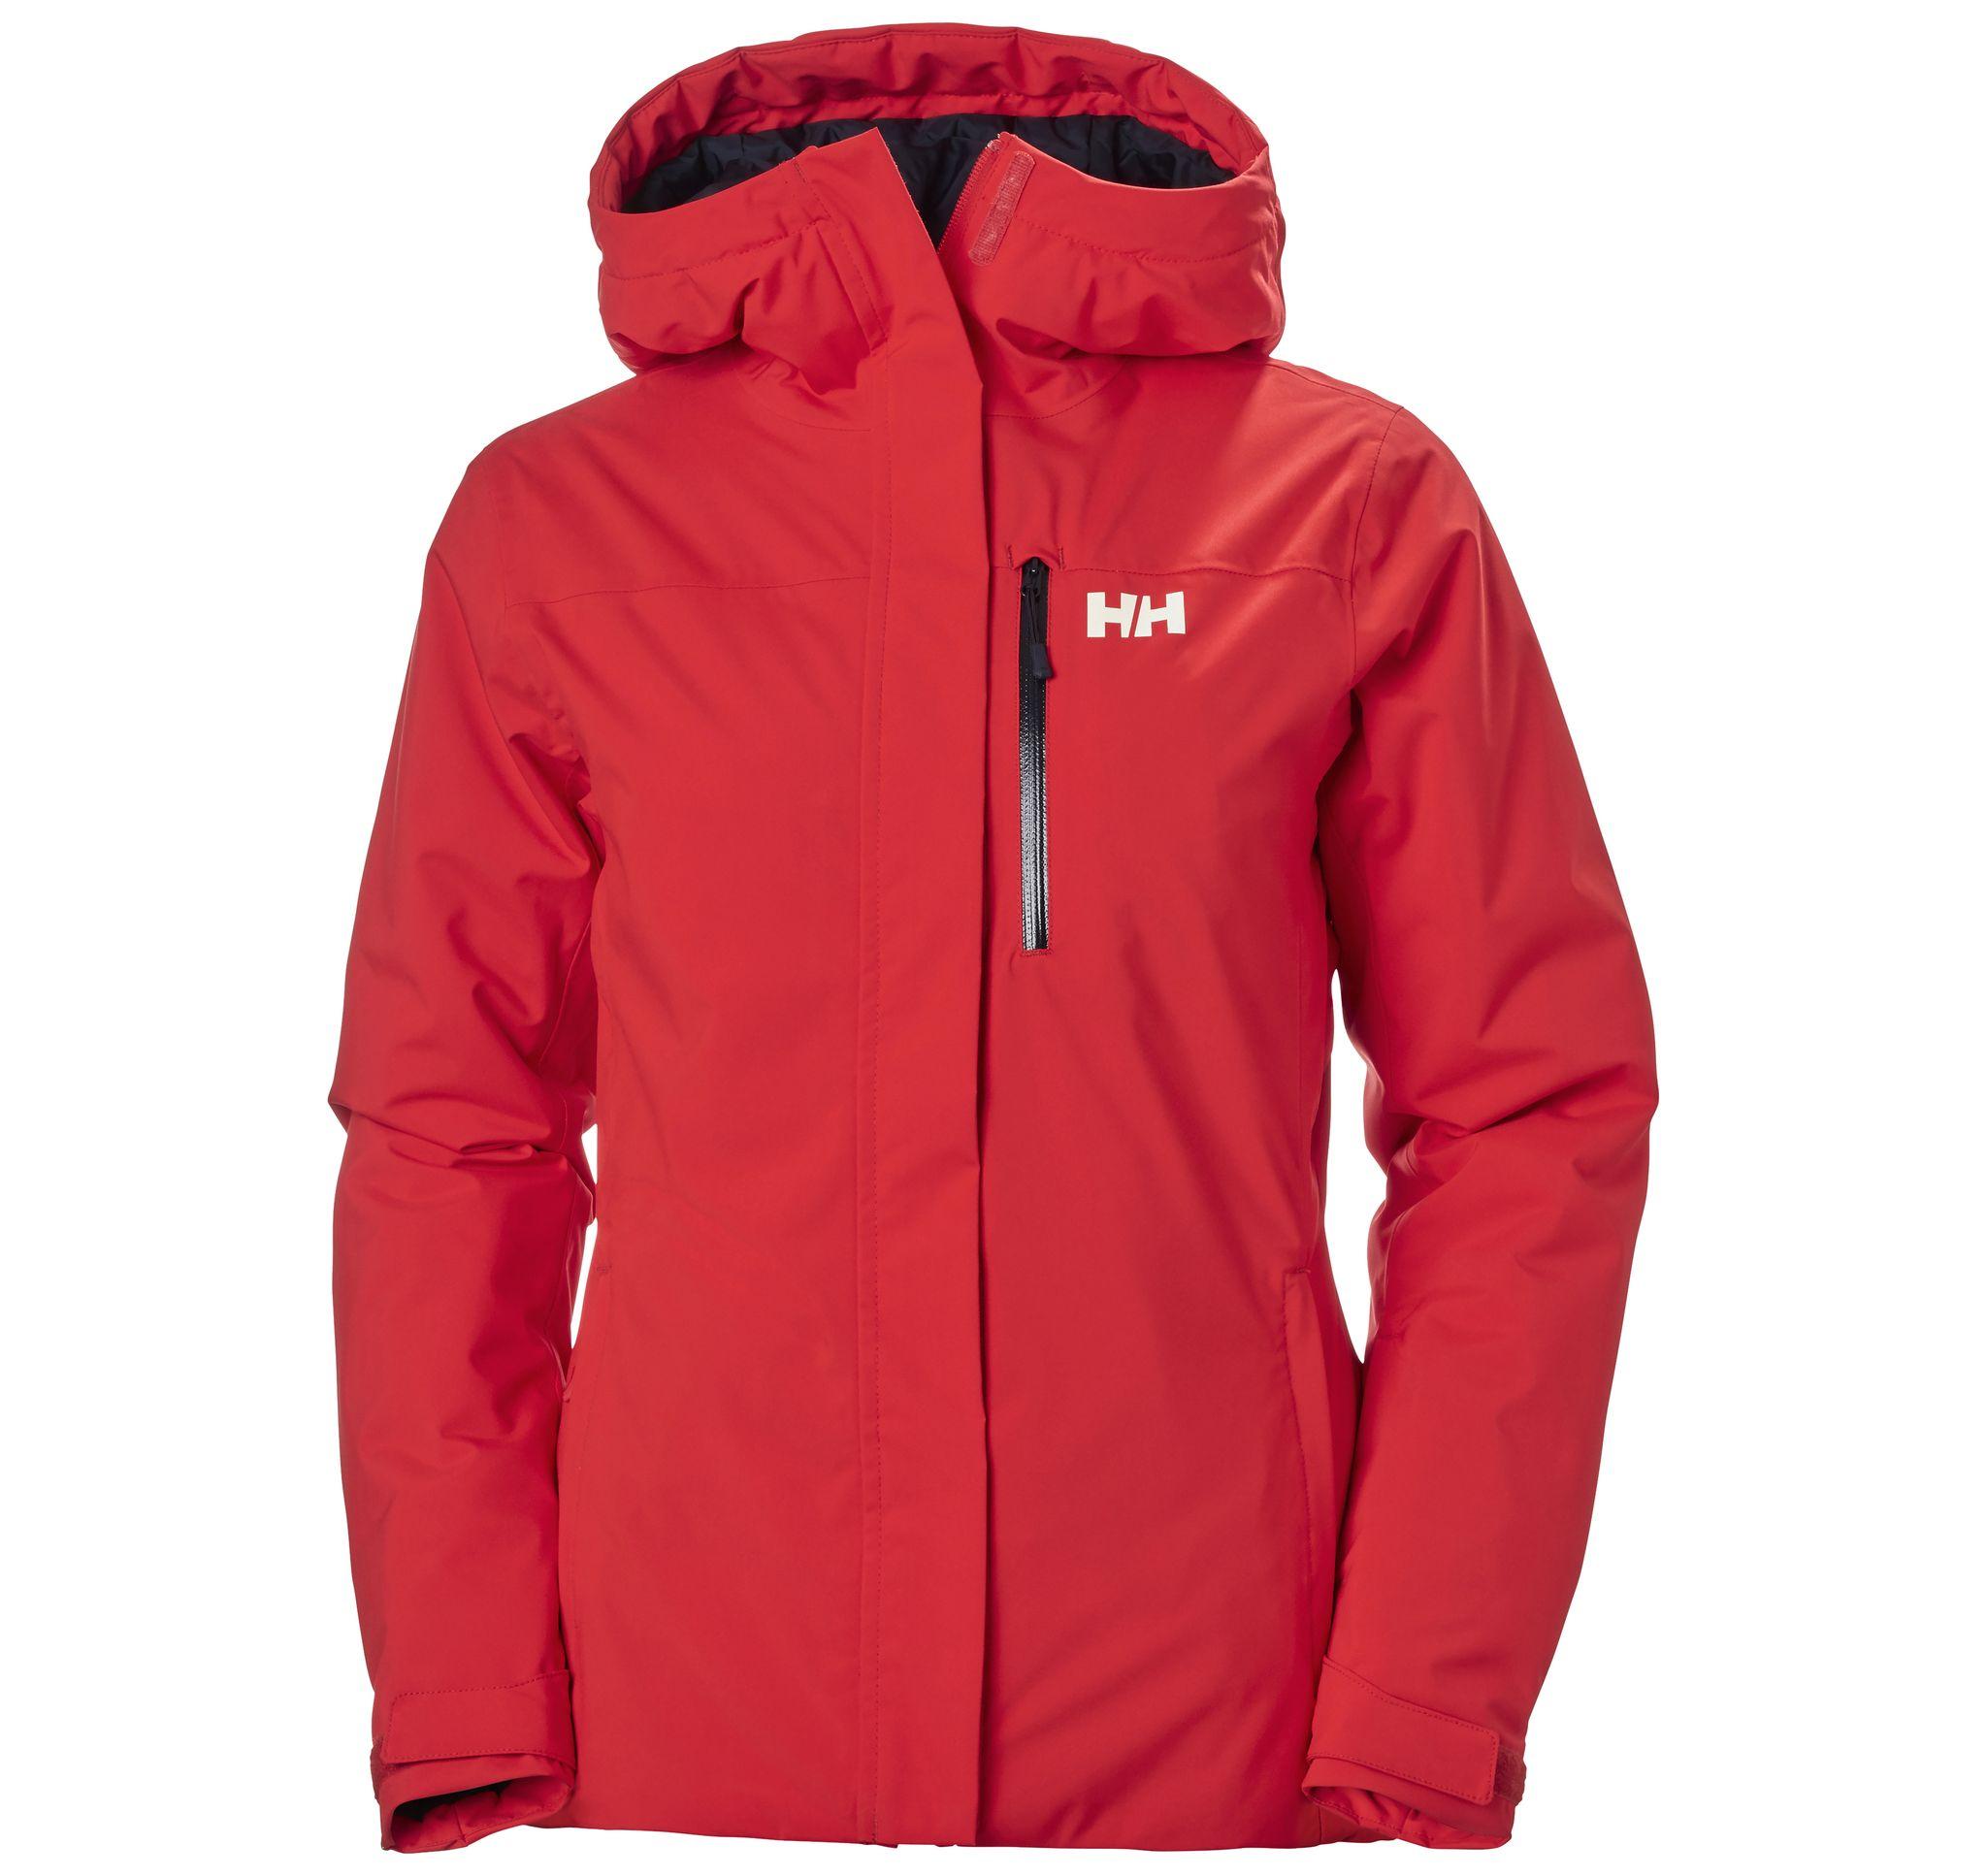 W Snowplay Jacket, Alert Red, L,  Helly Hansen Jackor